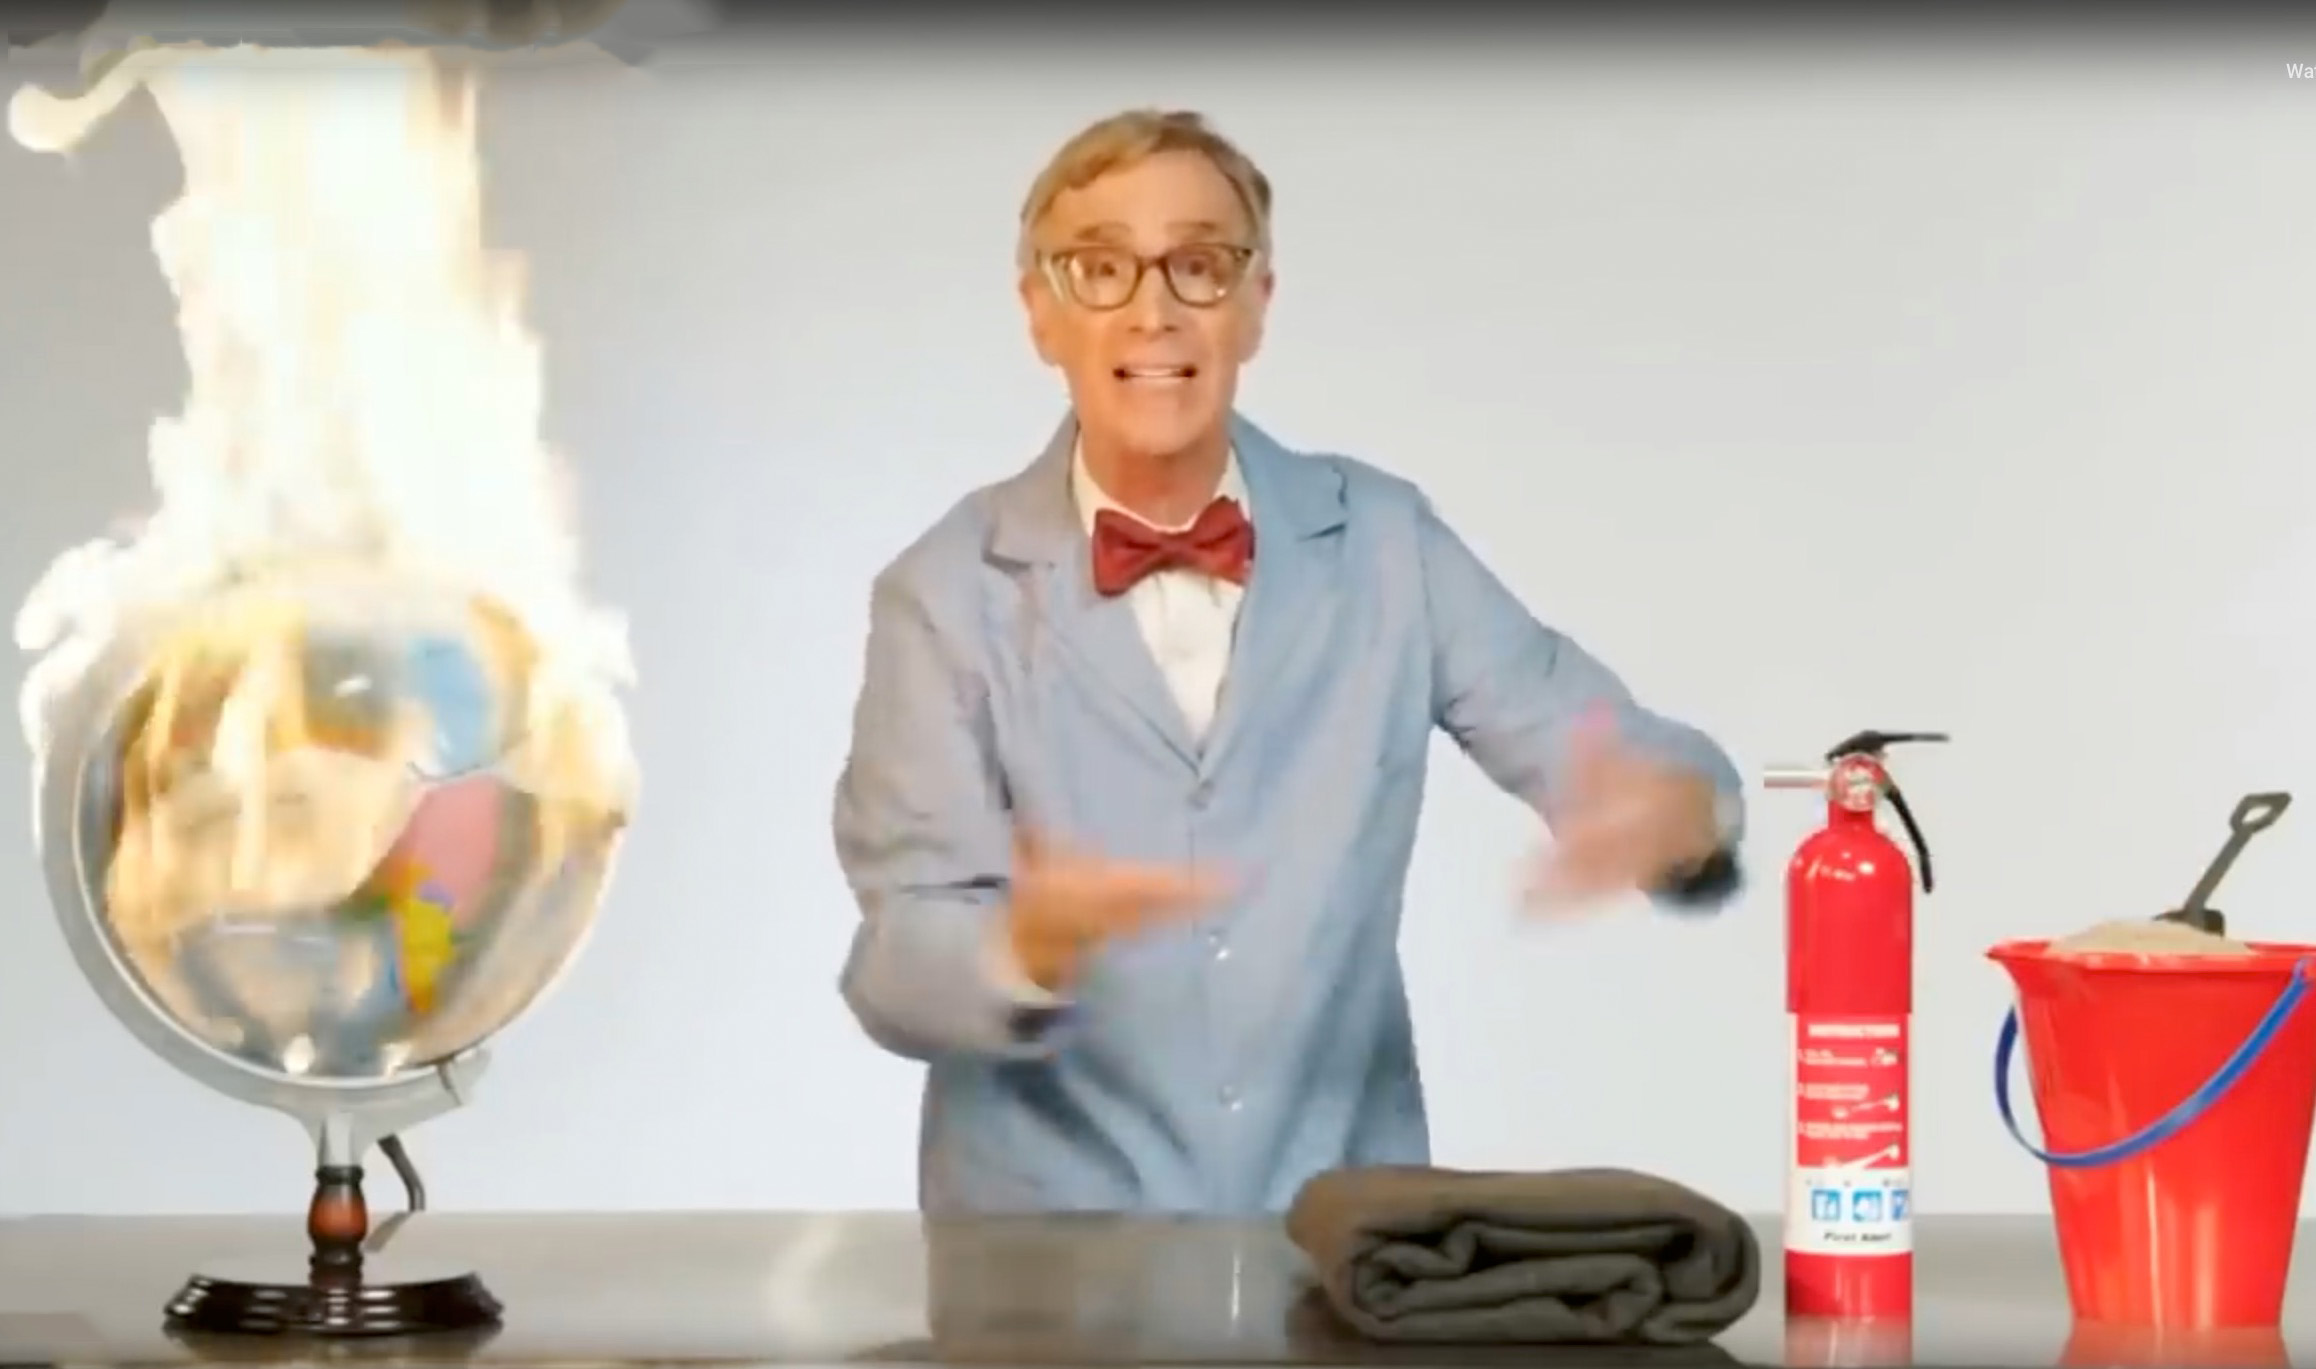 Bill Nye Goes On Profane Rant Over Climate Change